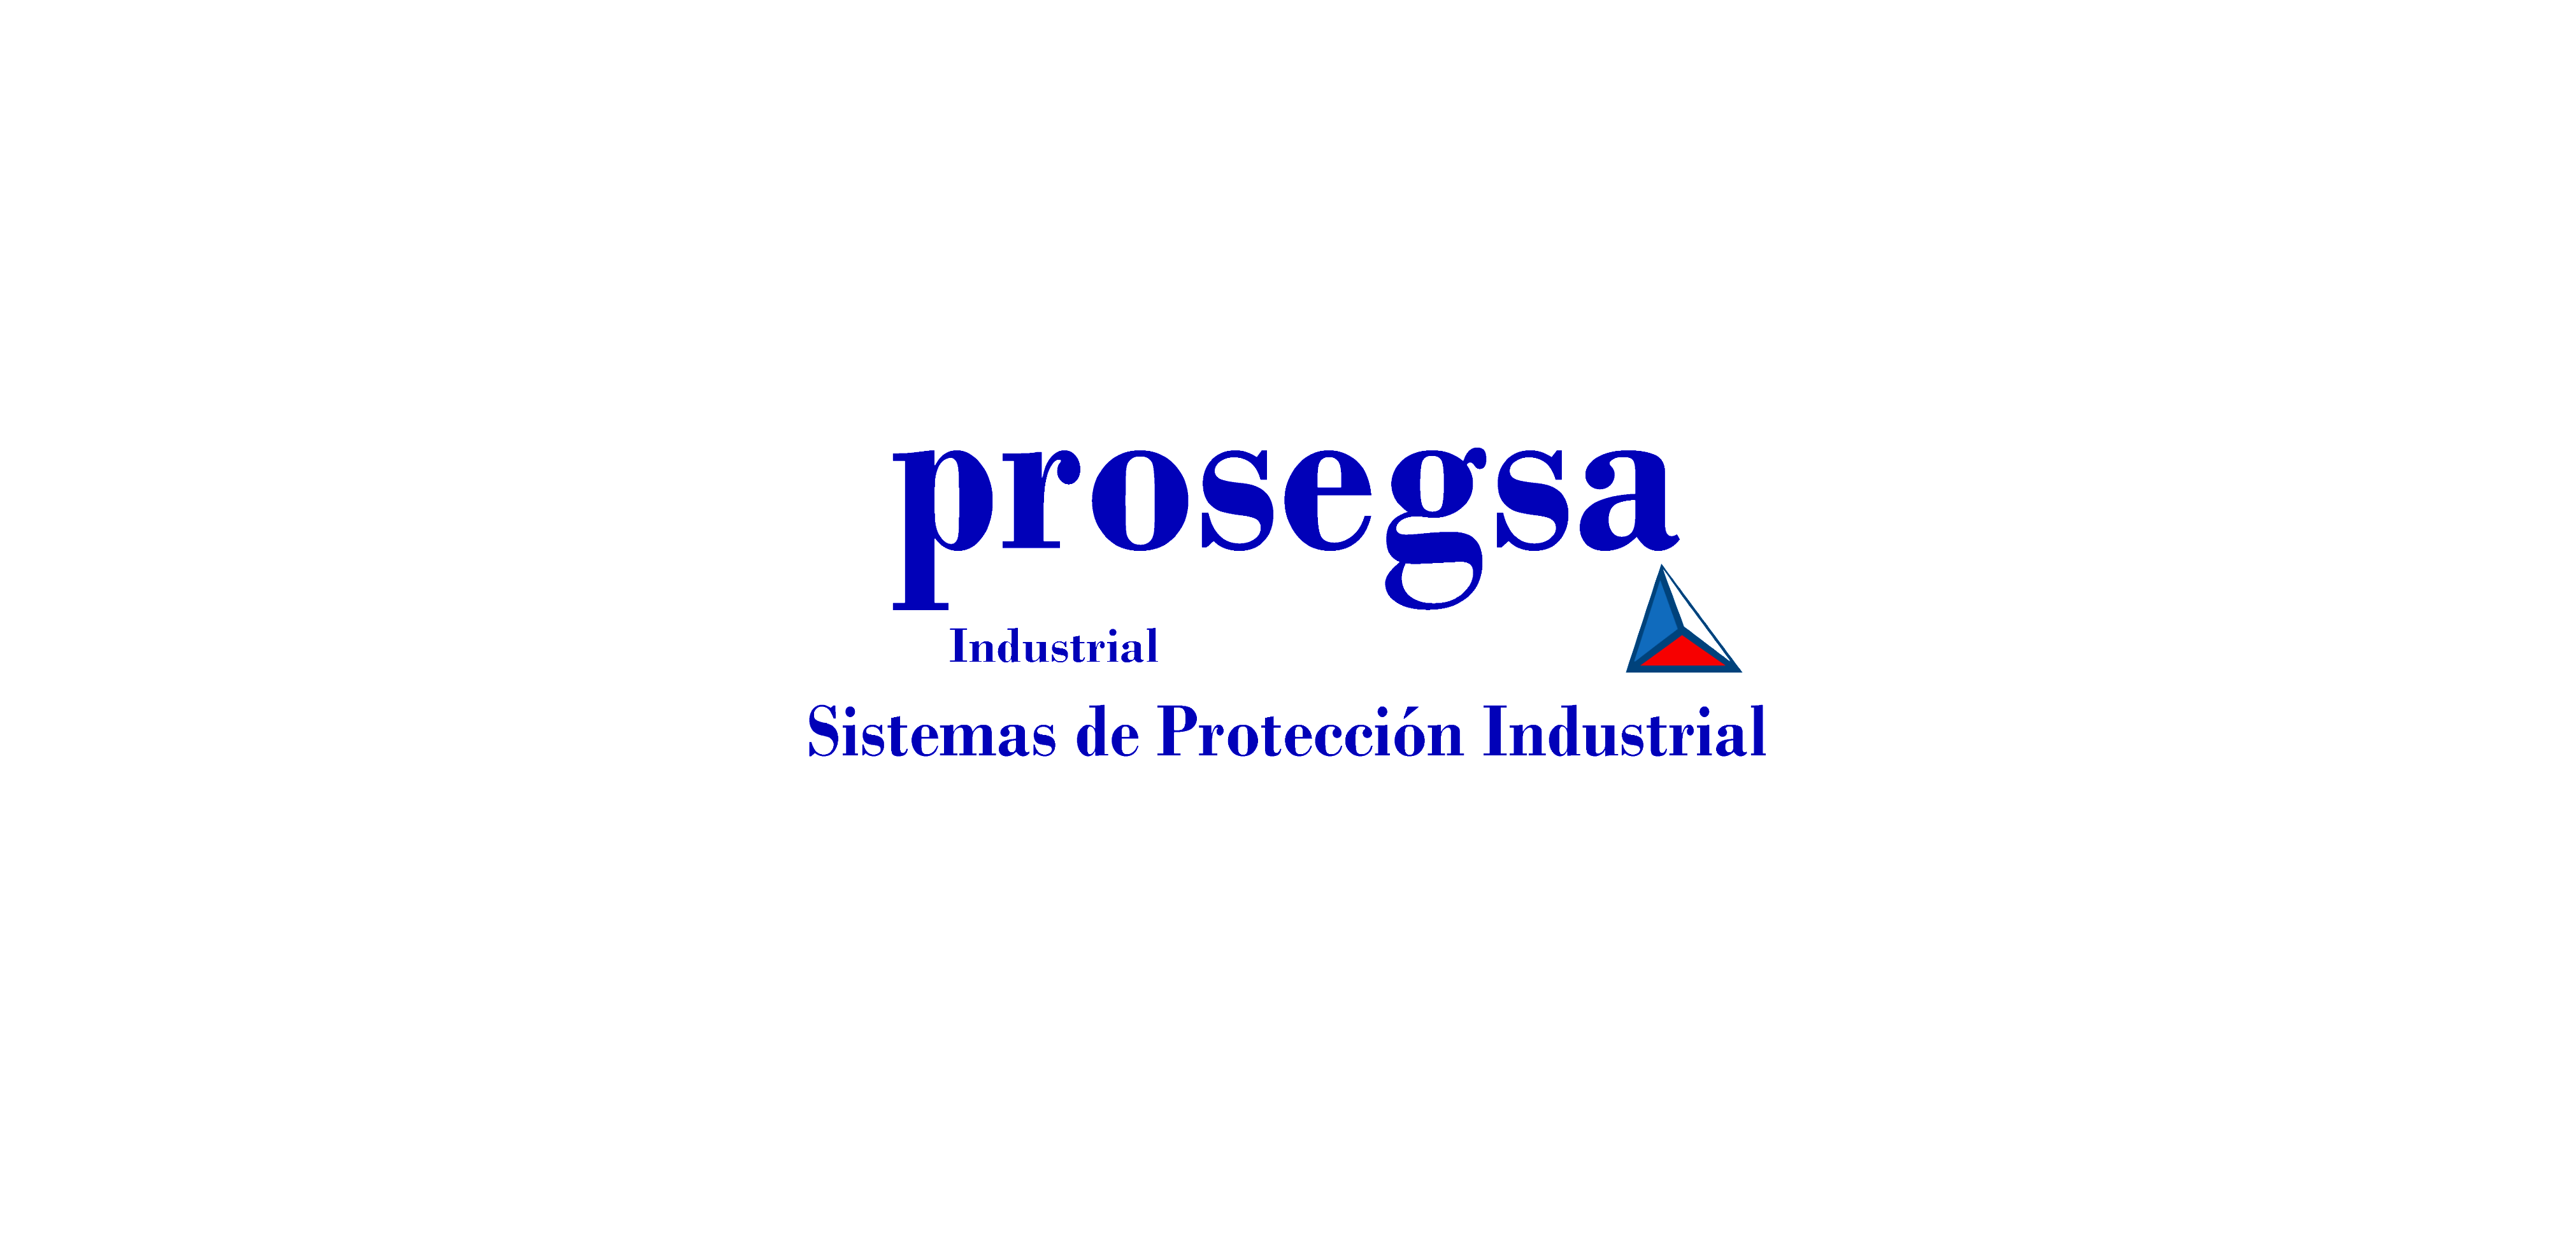 Prosegsa